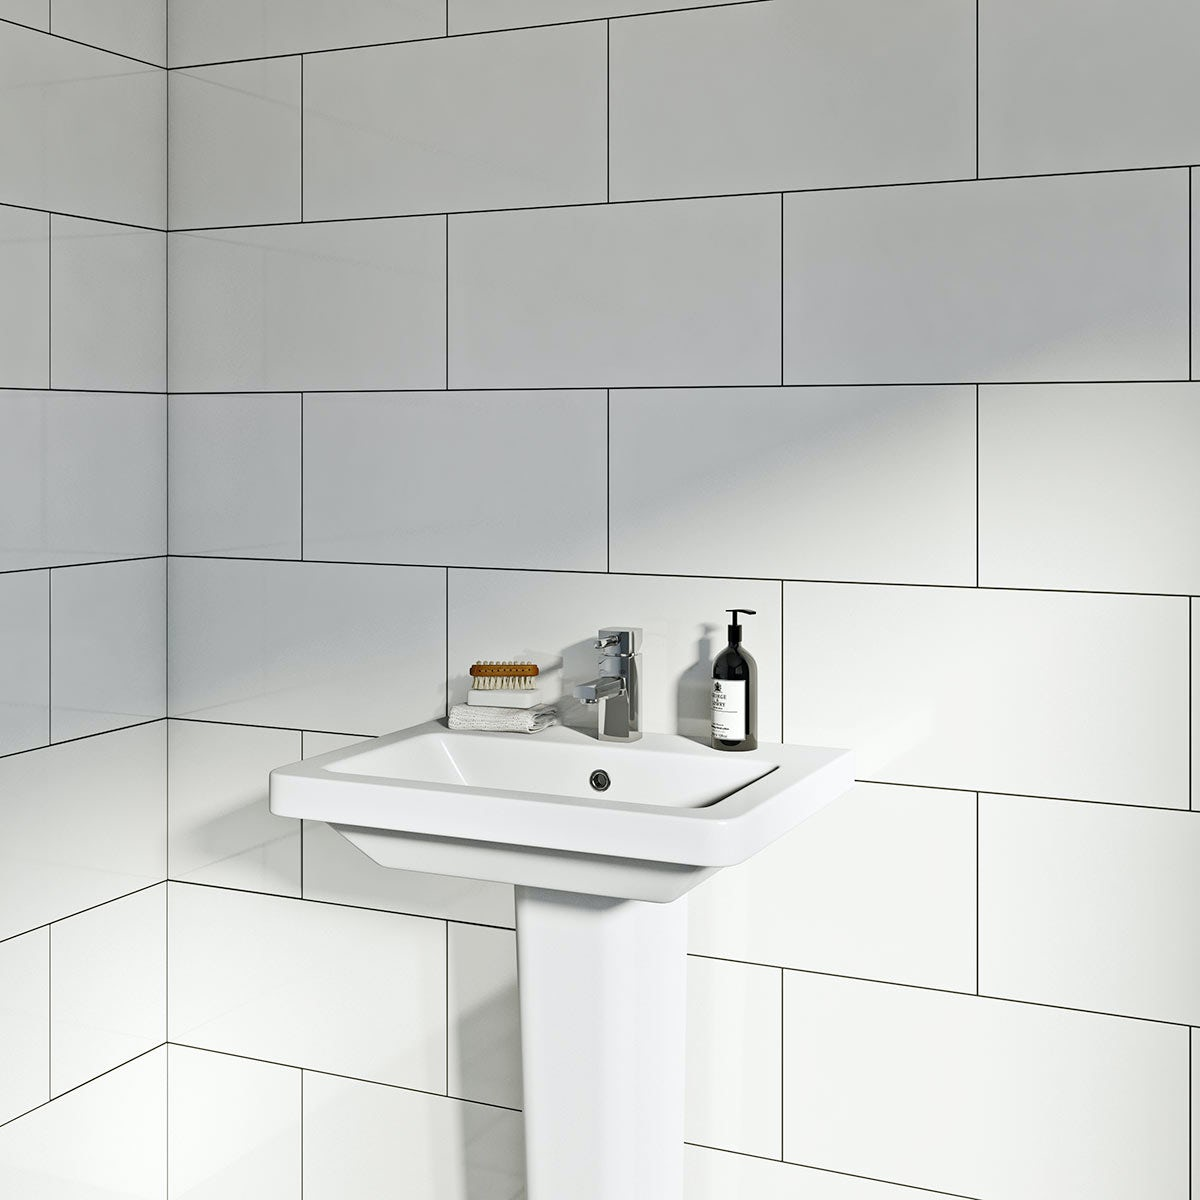 Pure White Gloss Tile 248mm x 498mm | VictoriaPlum.com